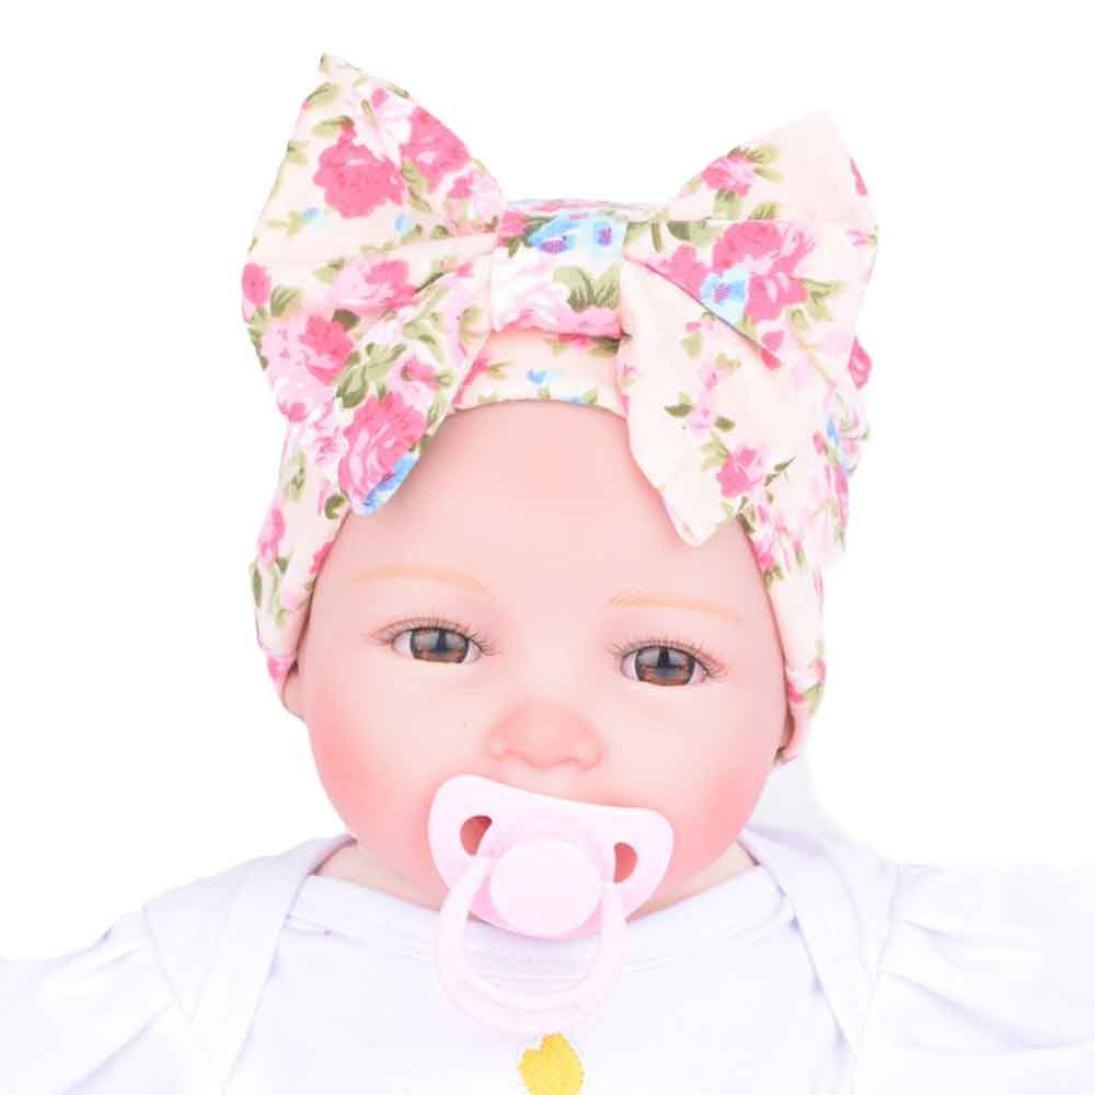 Kanpola Women Newborn Hospital Hat Newborn Baby Hats with Flower Bowknot Flower Hat Beige